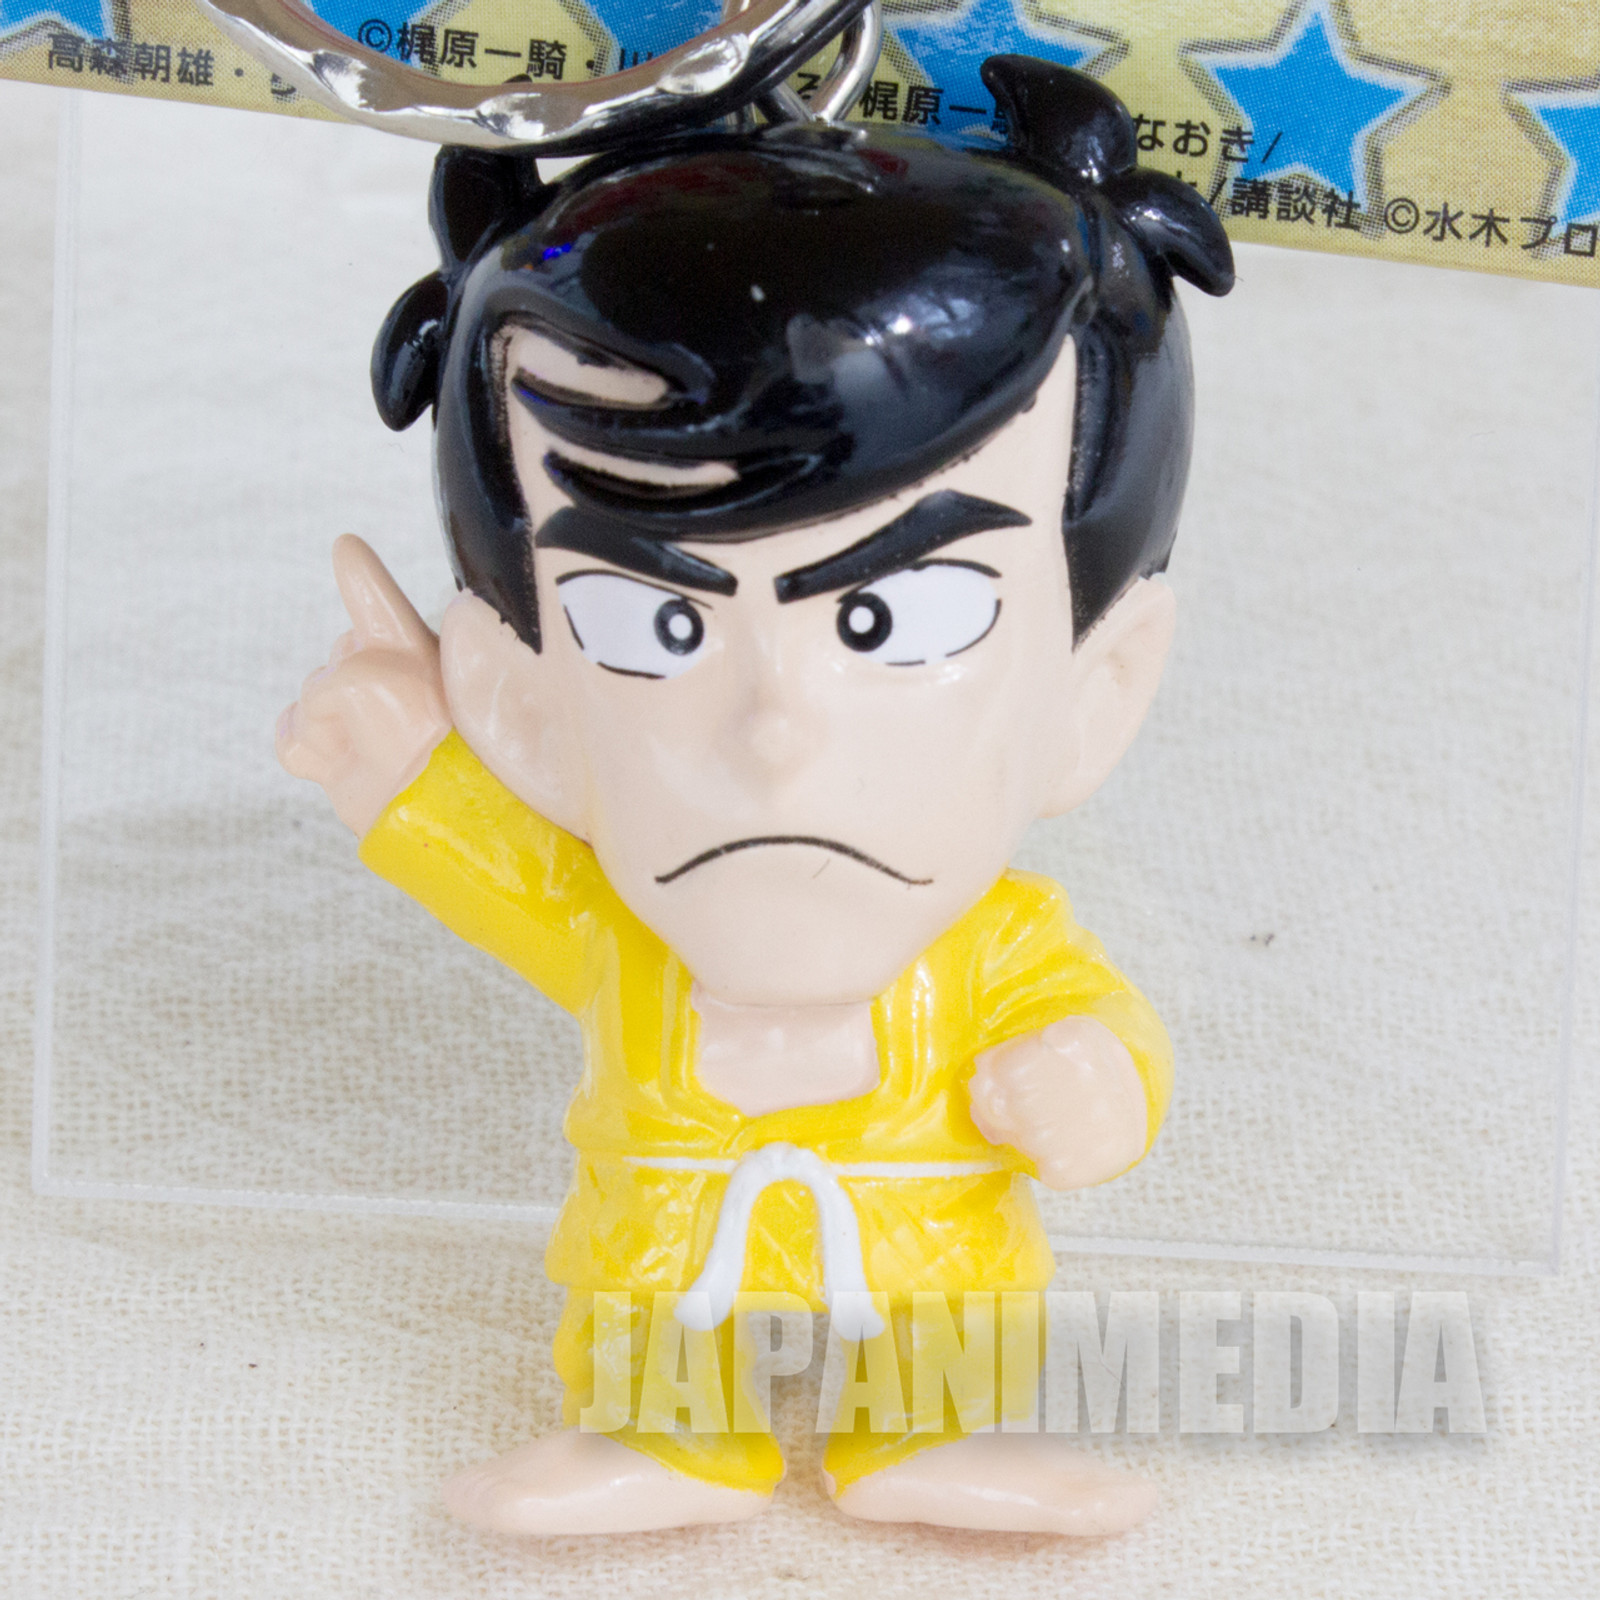 1 2 no sanshirou Azuma Sanshiro Mascot Figure Key Chain Shonen Magazine JAPAN